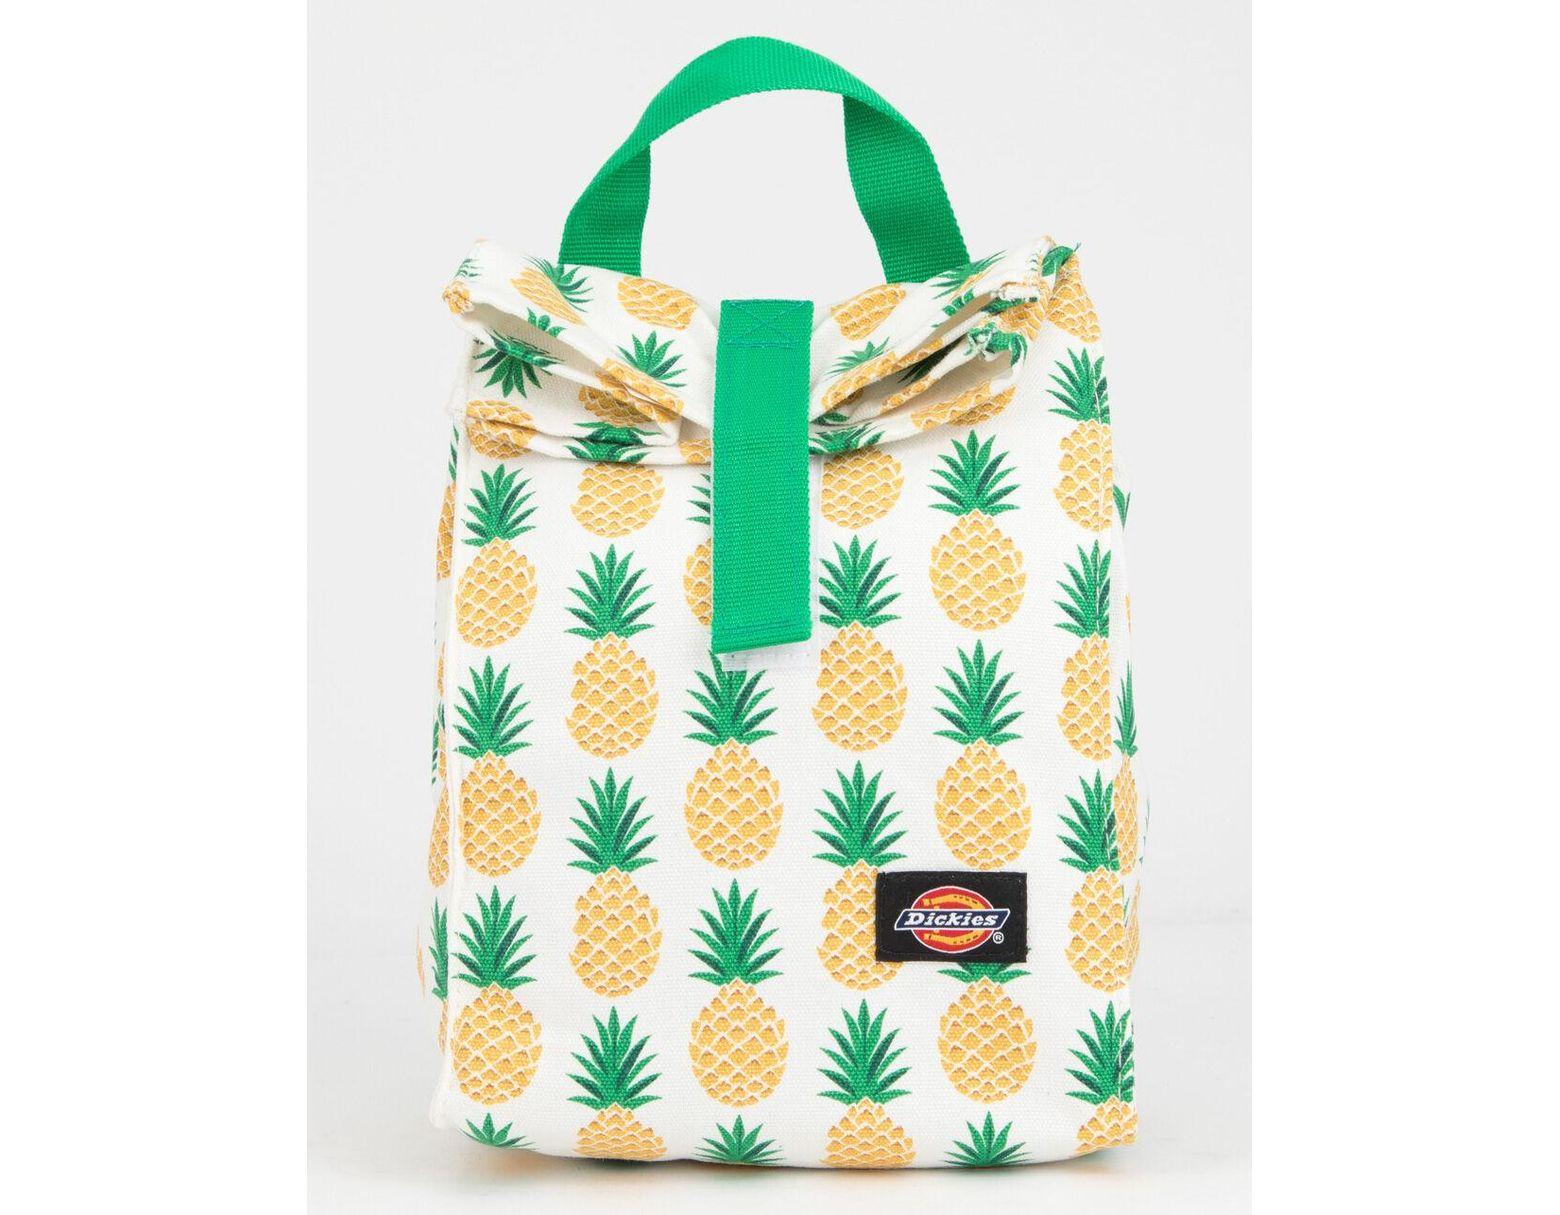 017db6b12 Dickies Pineapple Lunch Bag in Green - Lyst